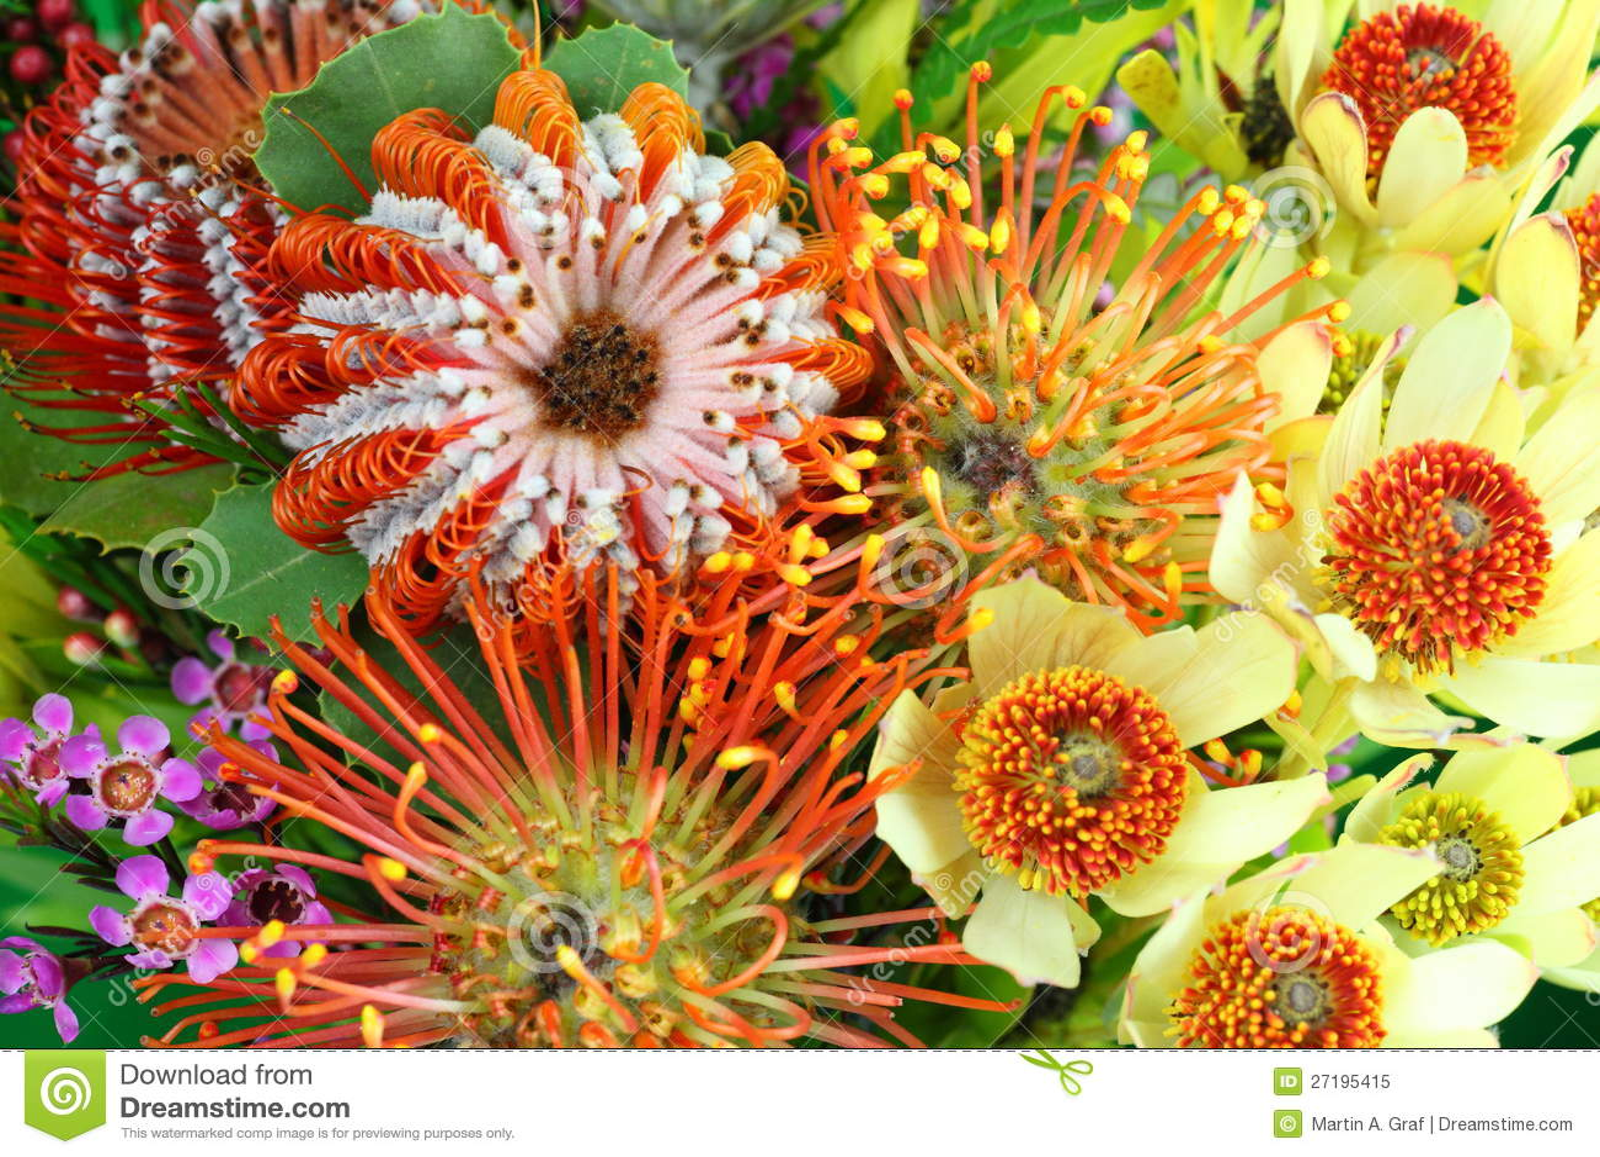 Bright Australian native flowers